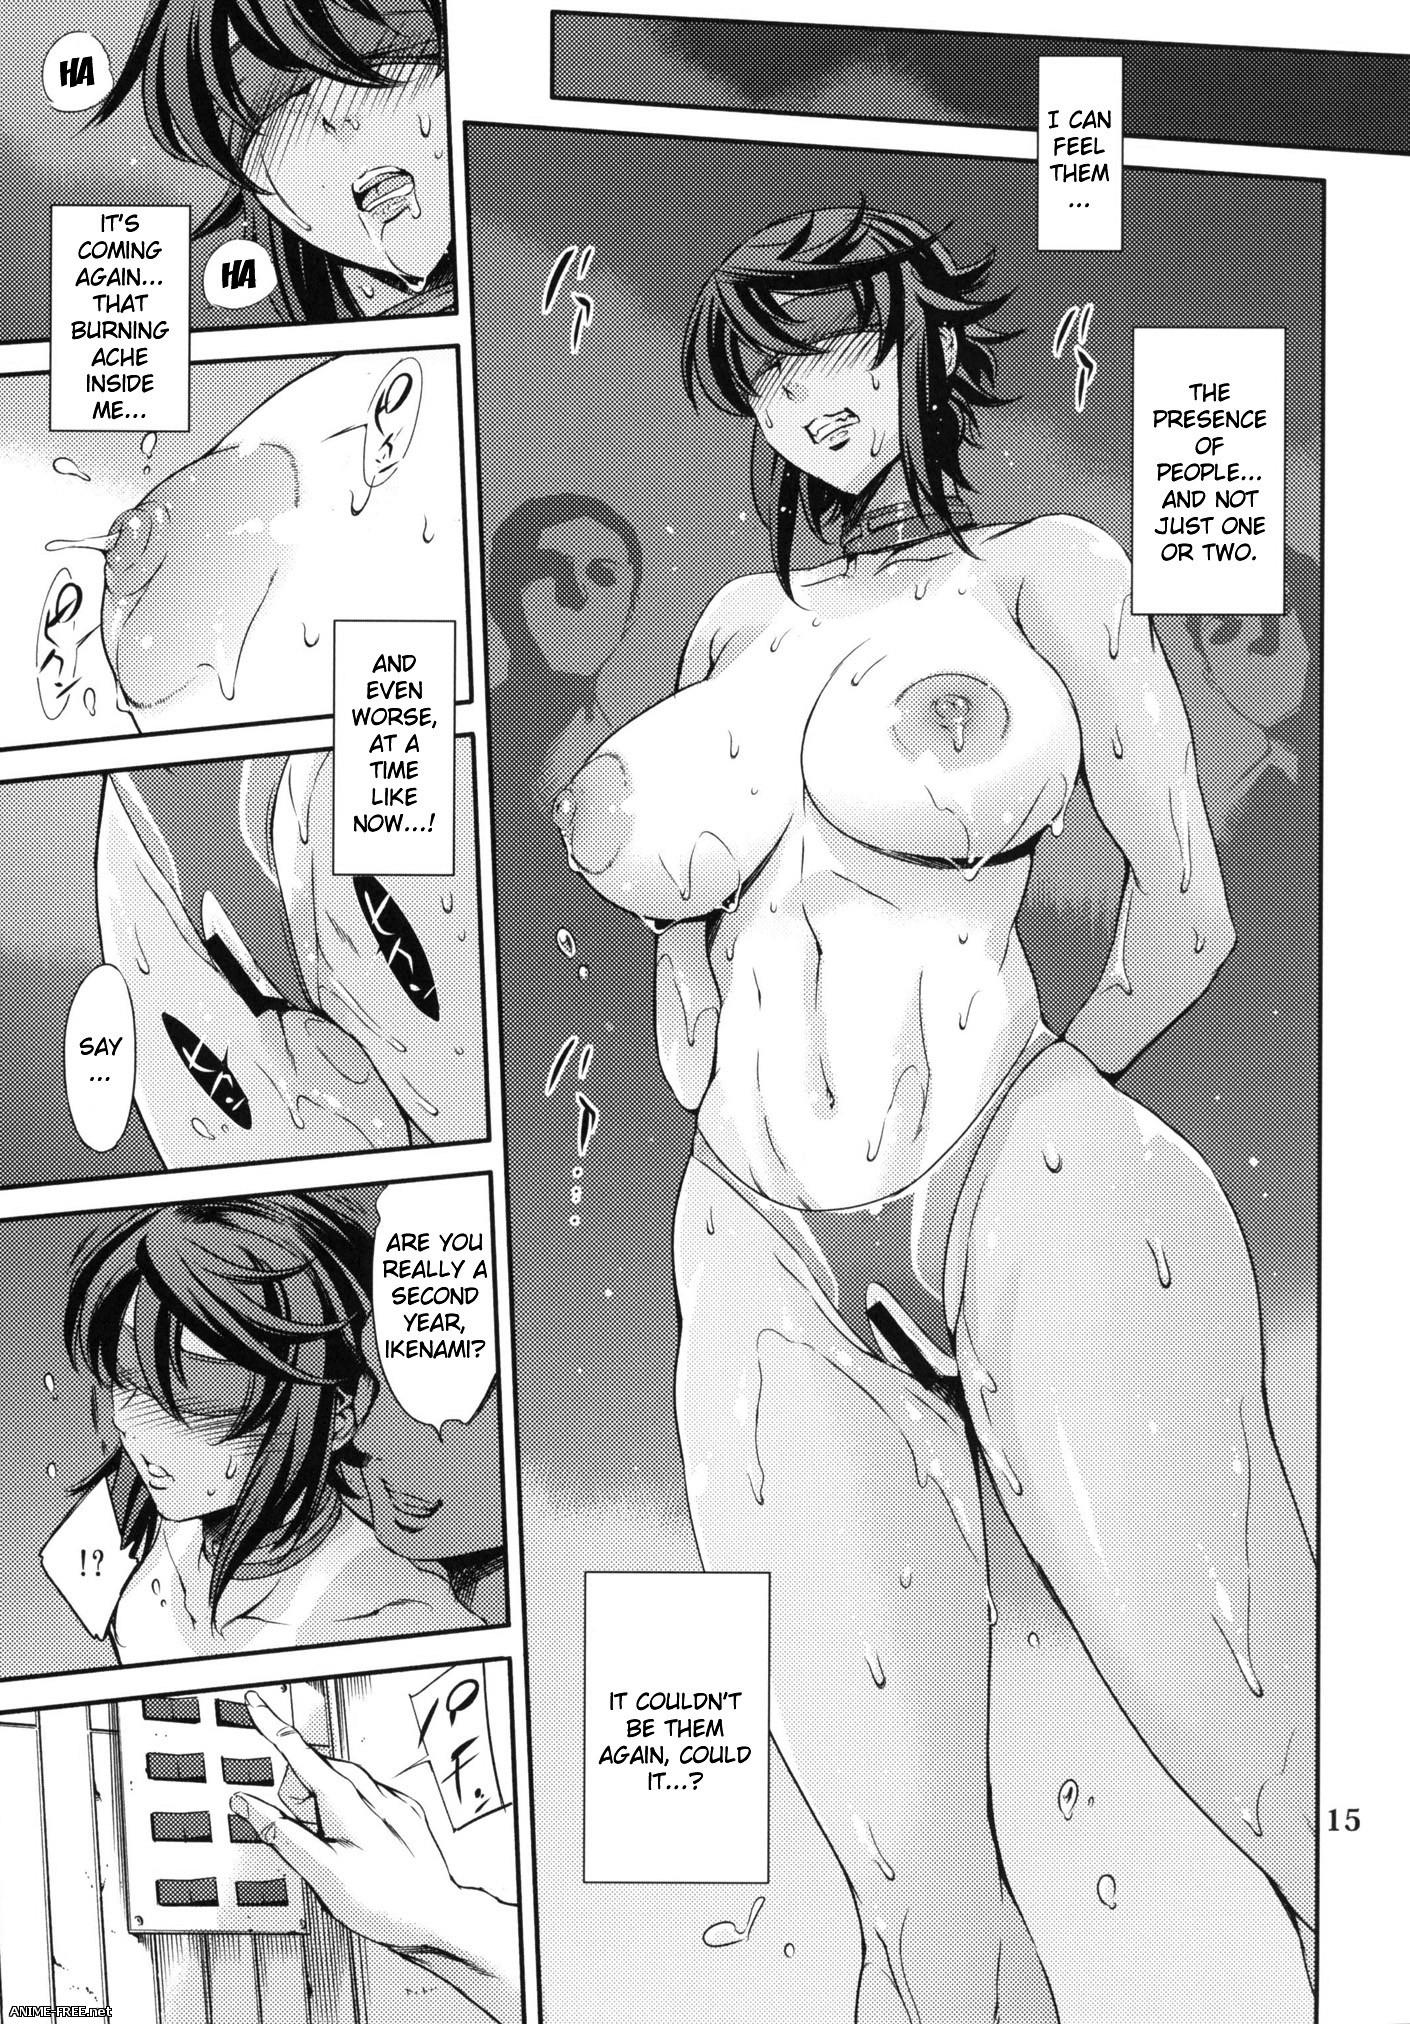 Maguro Teikoku / Mesu Gorilla - Сборник хентай манги [Ptcen] [RUS,ENG,JAP] Hentai Manga